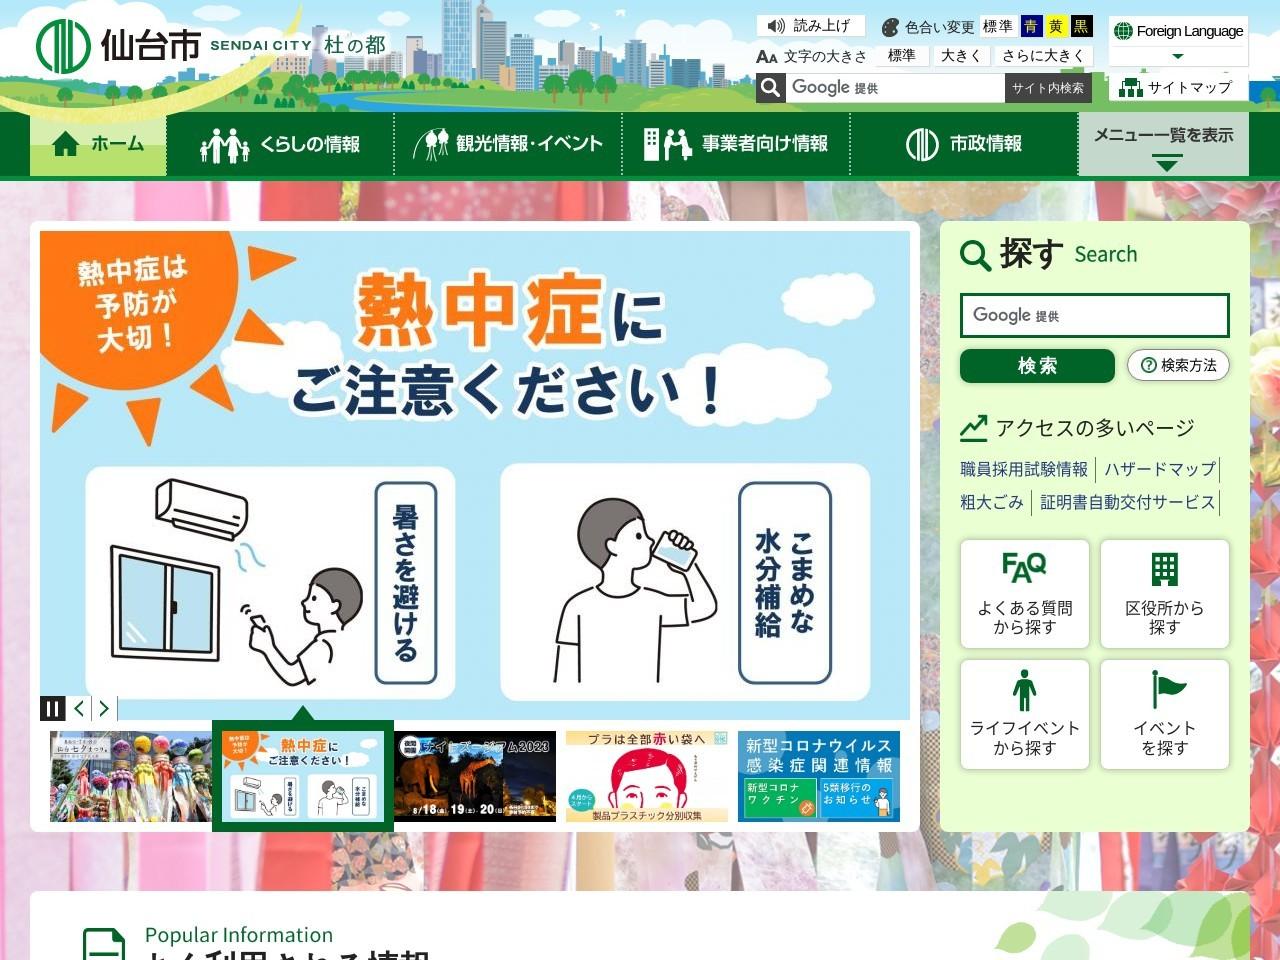 http://www.city.sendai.jp/korei/1214126_2656.html